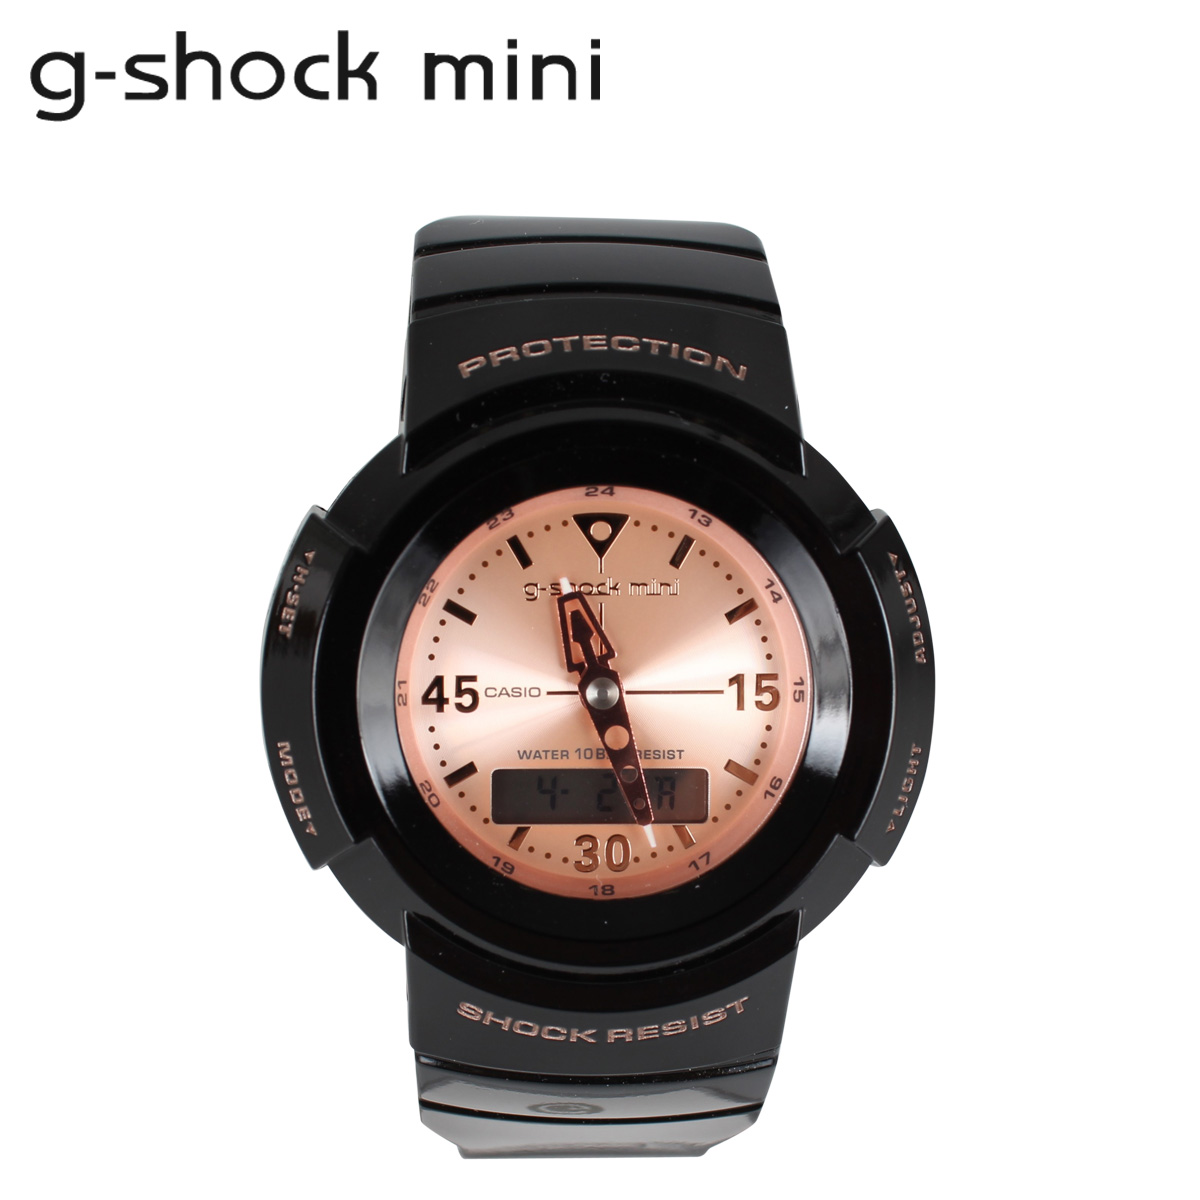 71aa3409198b Casio CASIO g-shock mini ladies watch men s GMN-500-1B3JR black x pink  1    28 new in stock   regular